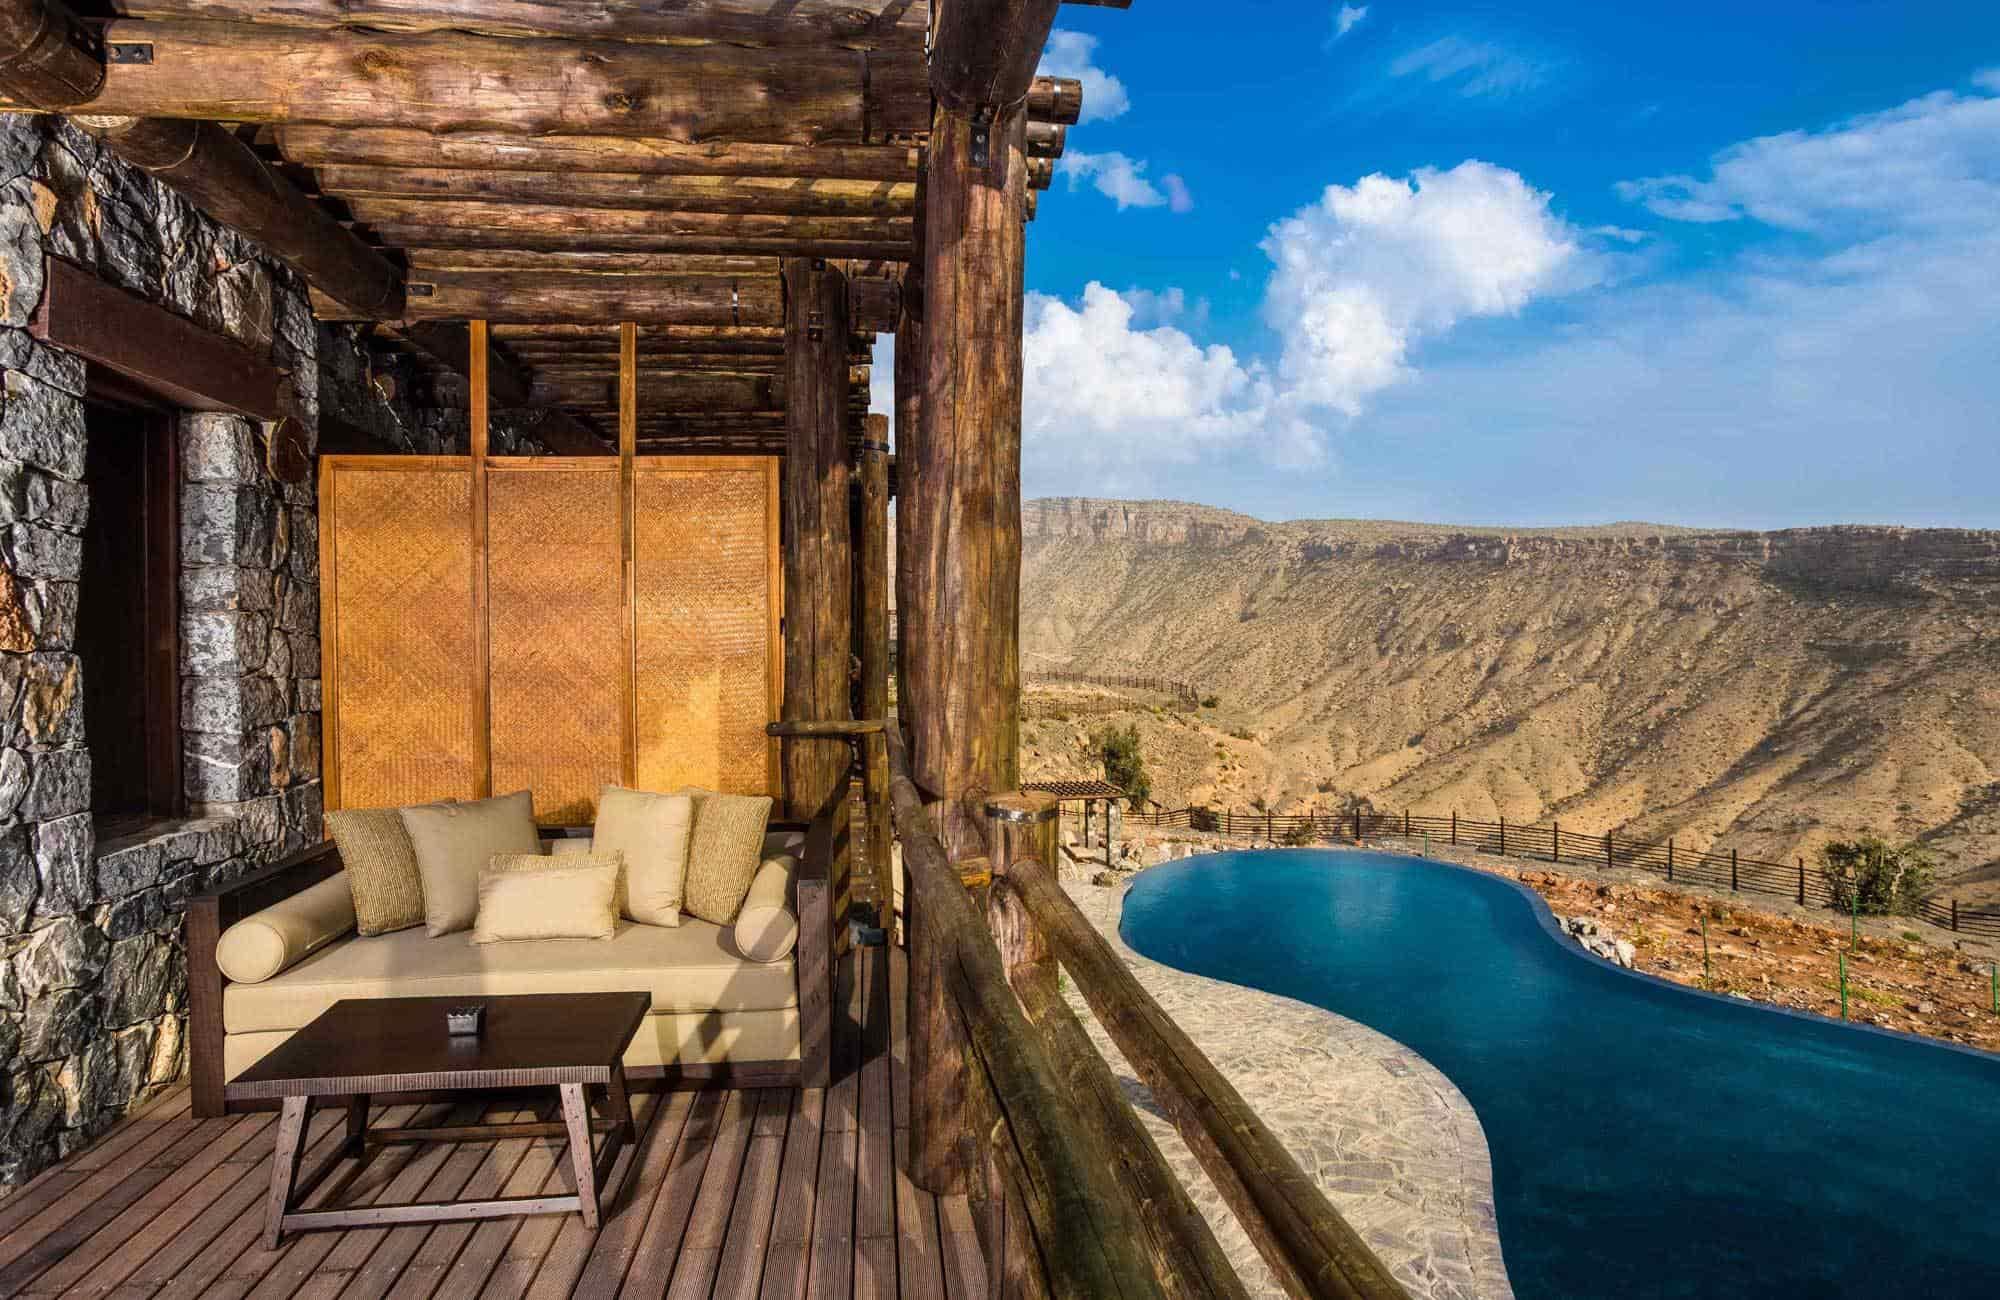 Voyage Oman - Séjour Alila-jabal-akhdar - Amplitudes